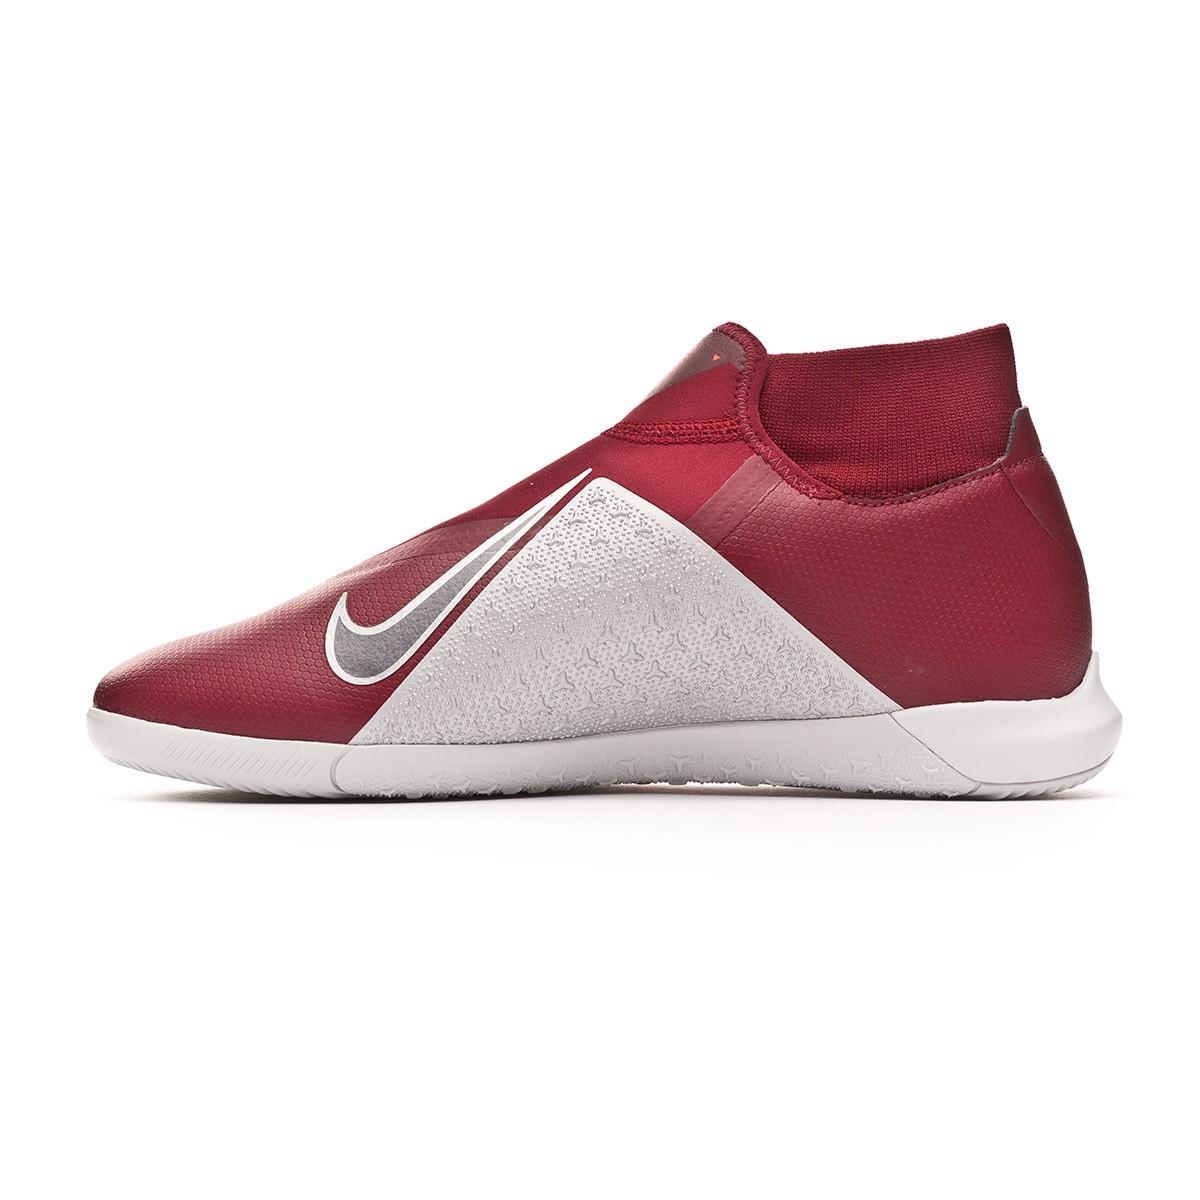 f17ebd912e1 Futsal Boot Nike Phantom Vision Academy DF IC Team red-Metallic dark grey- Bright crimson - Football store Fútbol Emotion